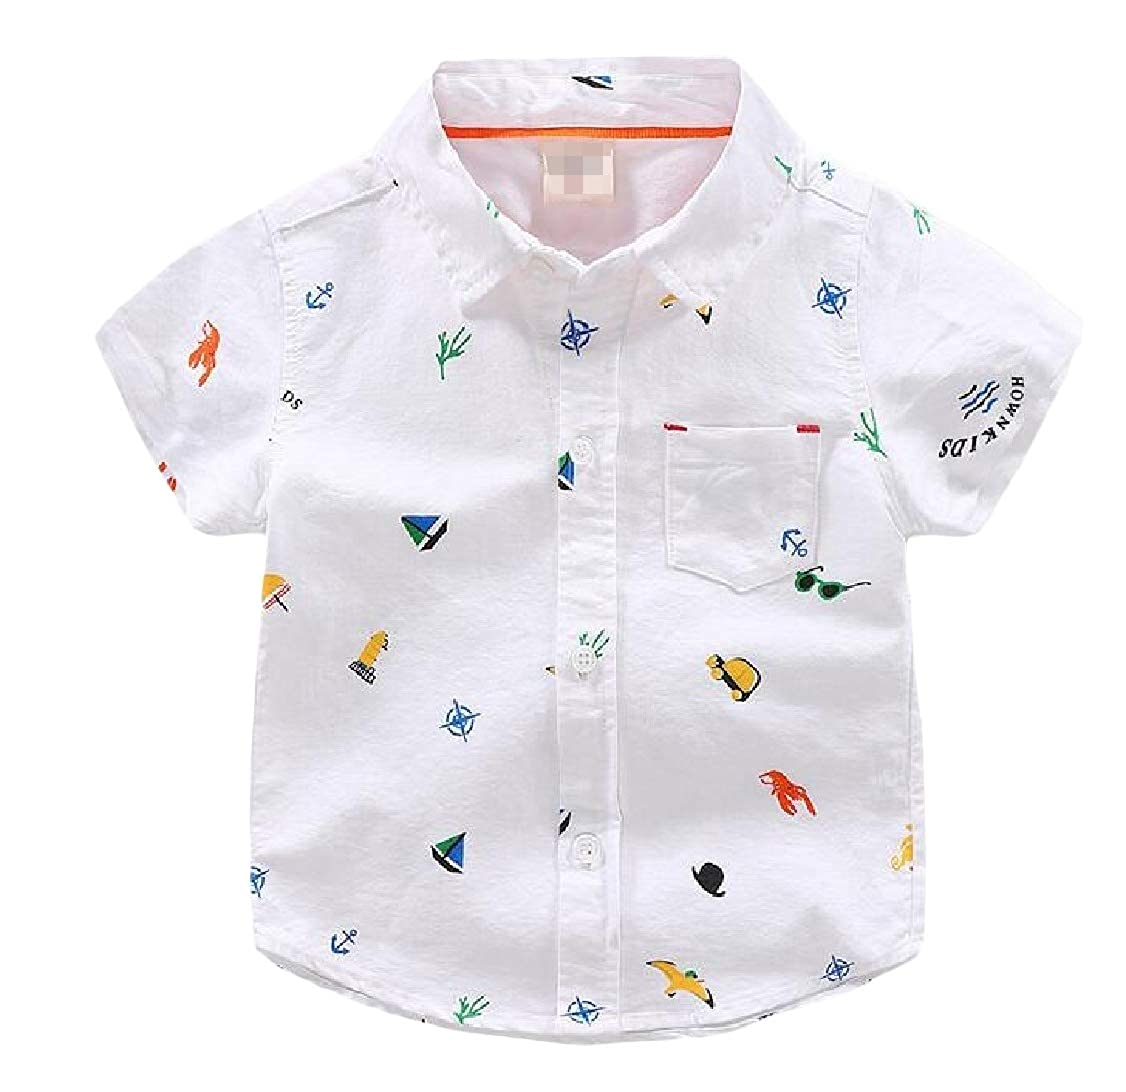 Lutratocro Boys Lapel Adorable Short Sleeve Summer Button Front Print Shirts